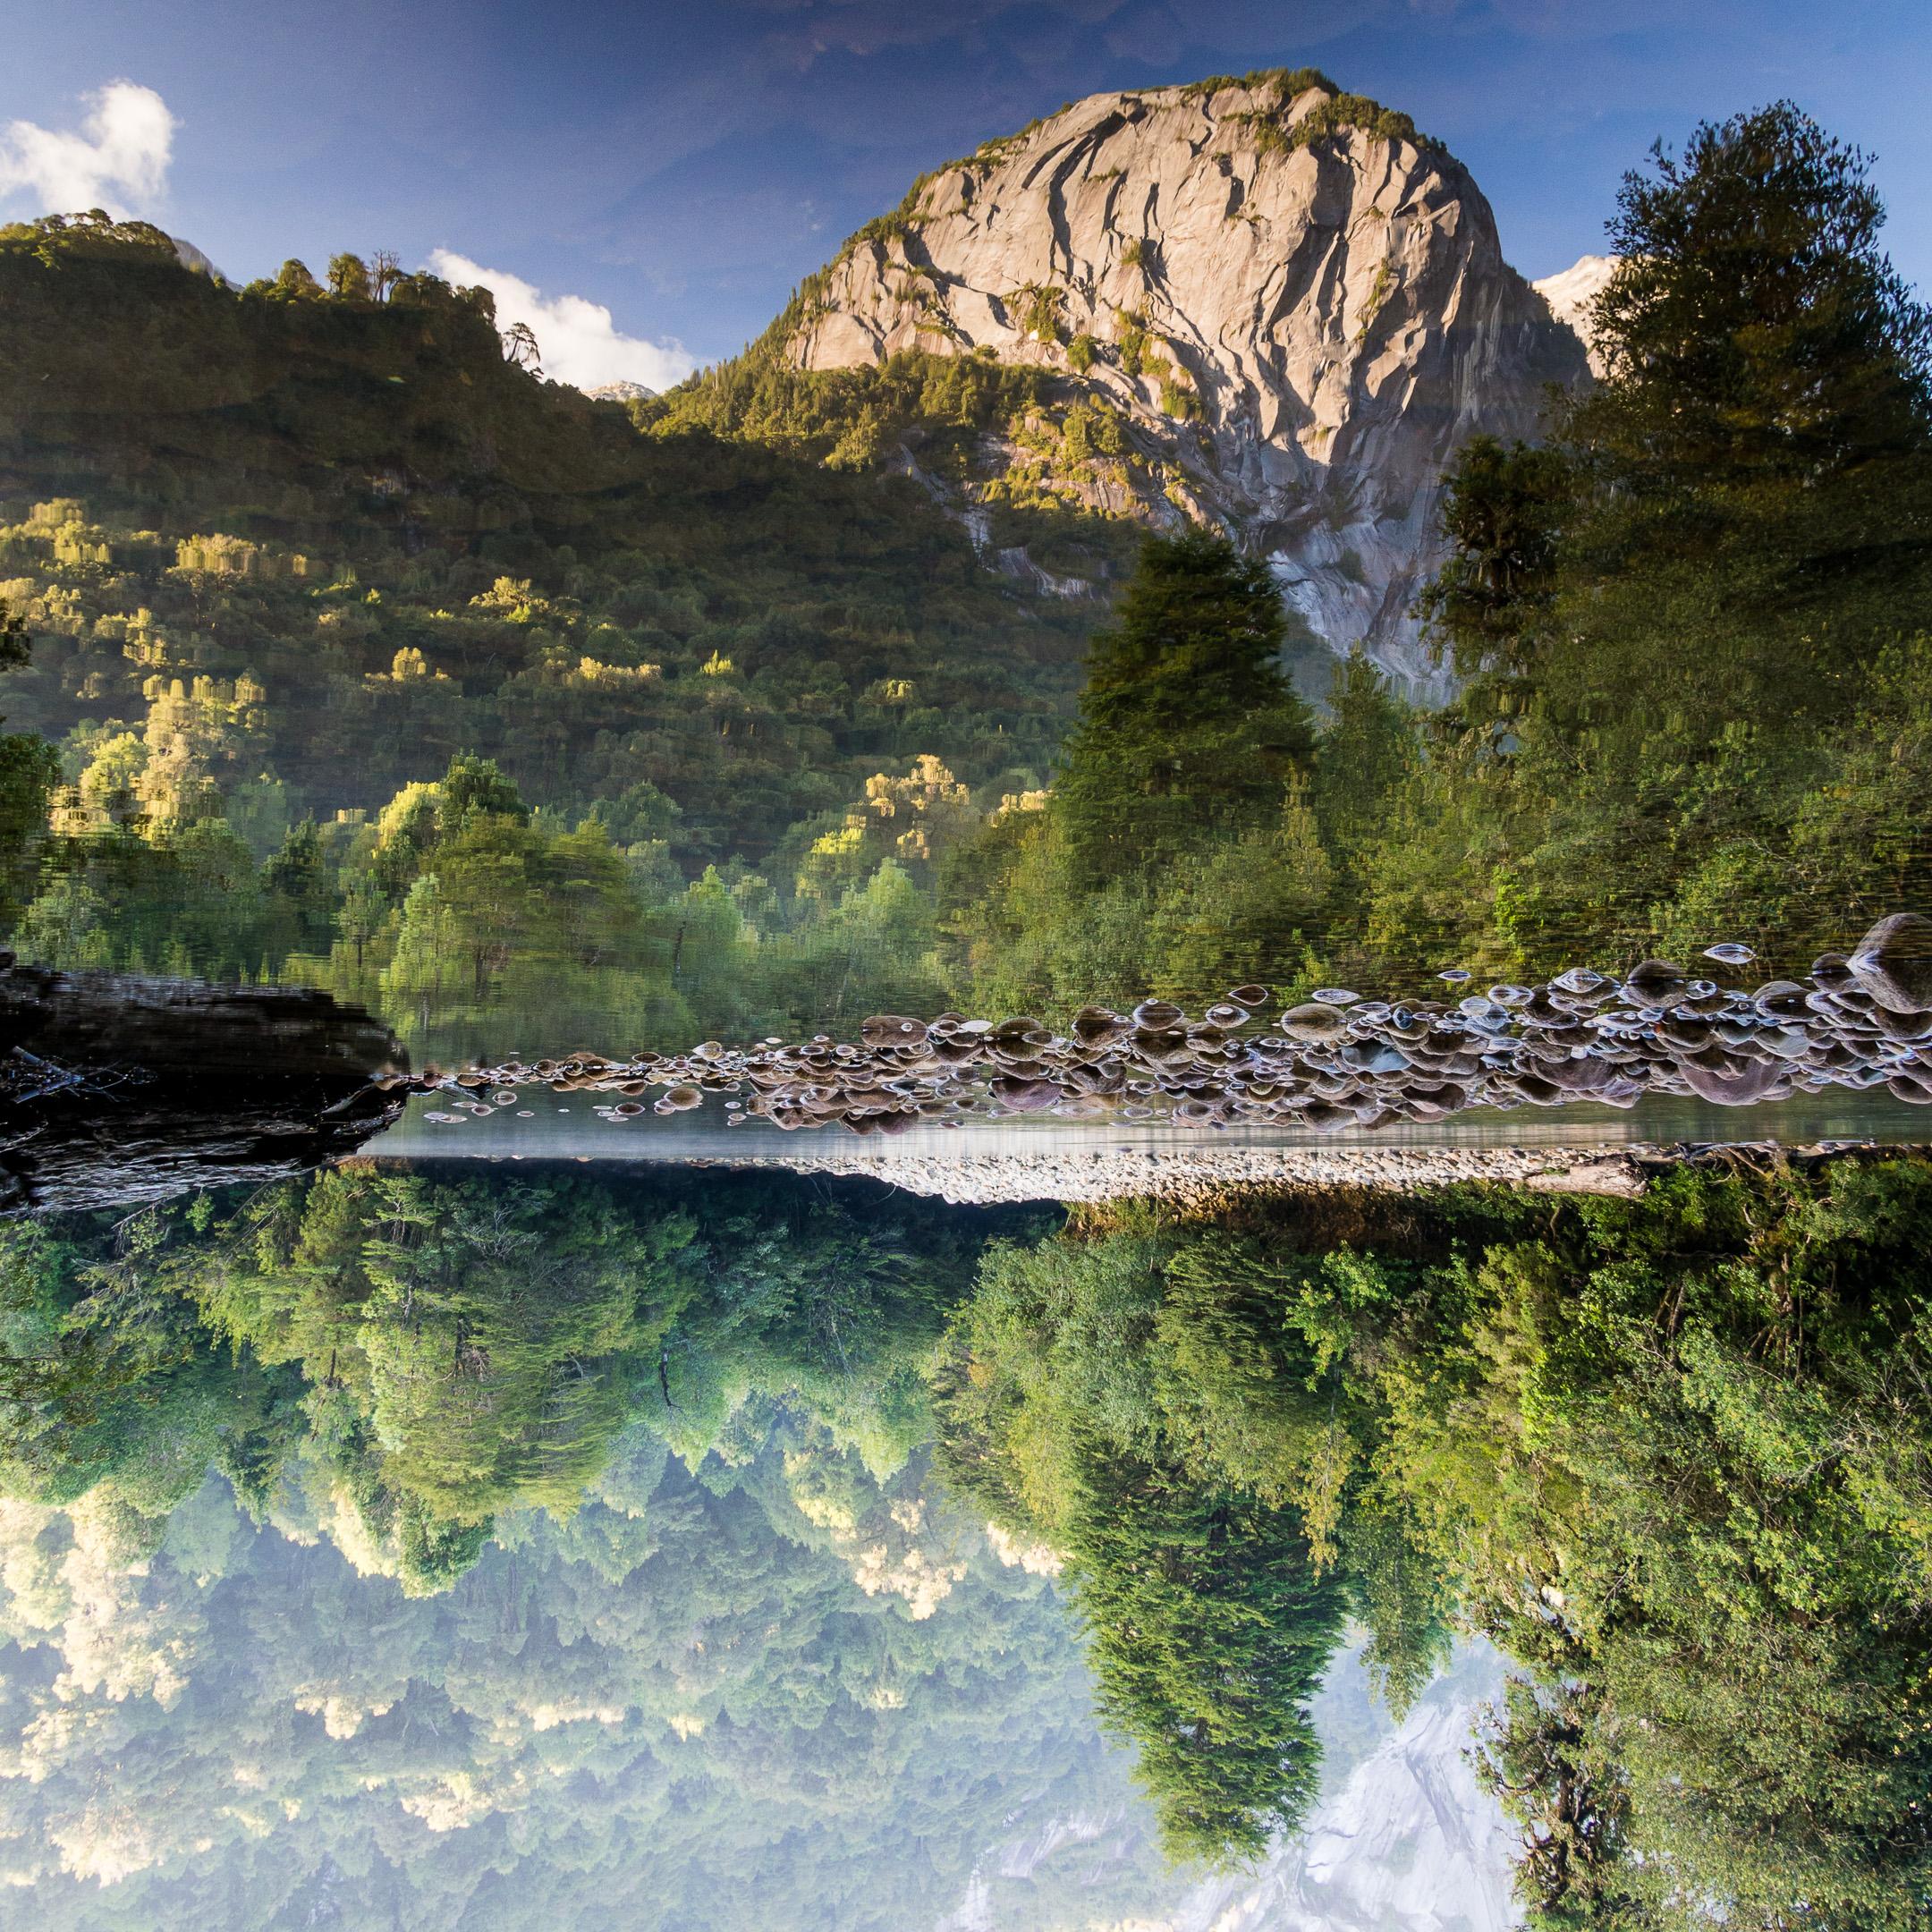 Patagonia - 130202 - 2026224.jpg